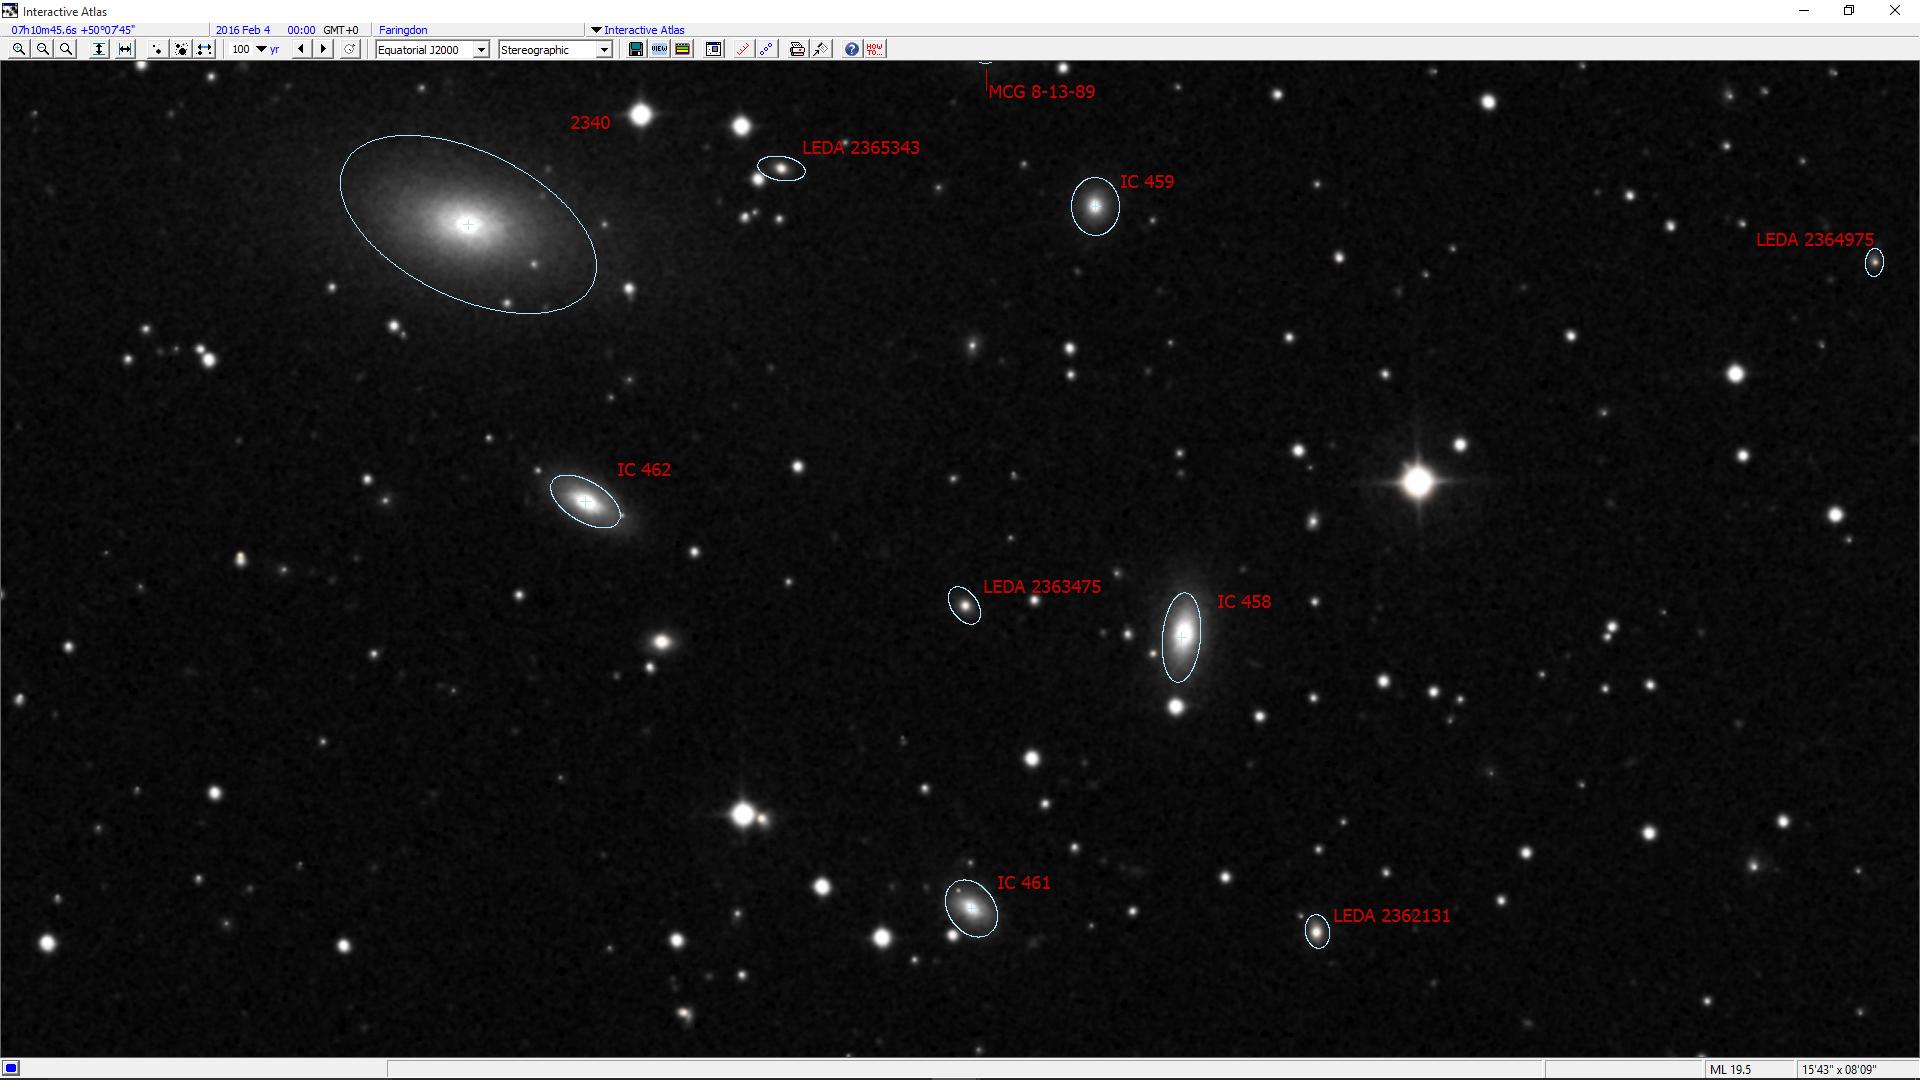 webb deep sky society deep sky observations of galaxy megastar chart of the ngc 2340 field